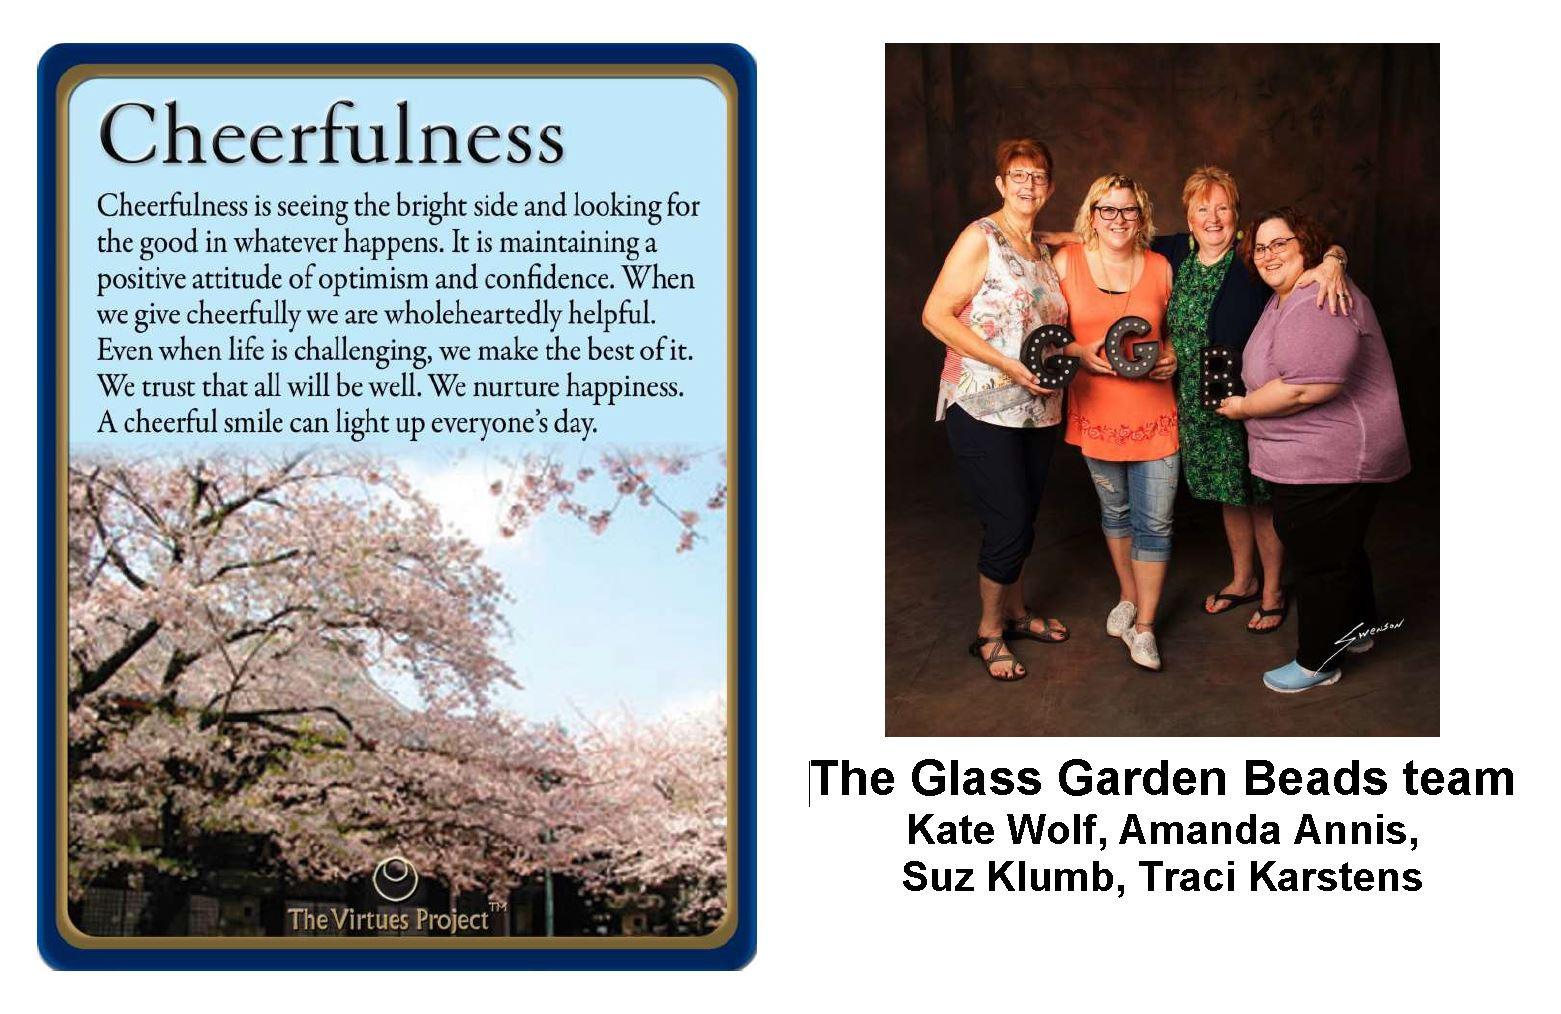 Glass Garden Beads Cheerfulness.JPG